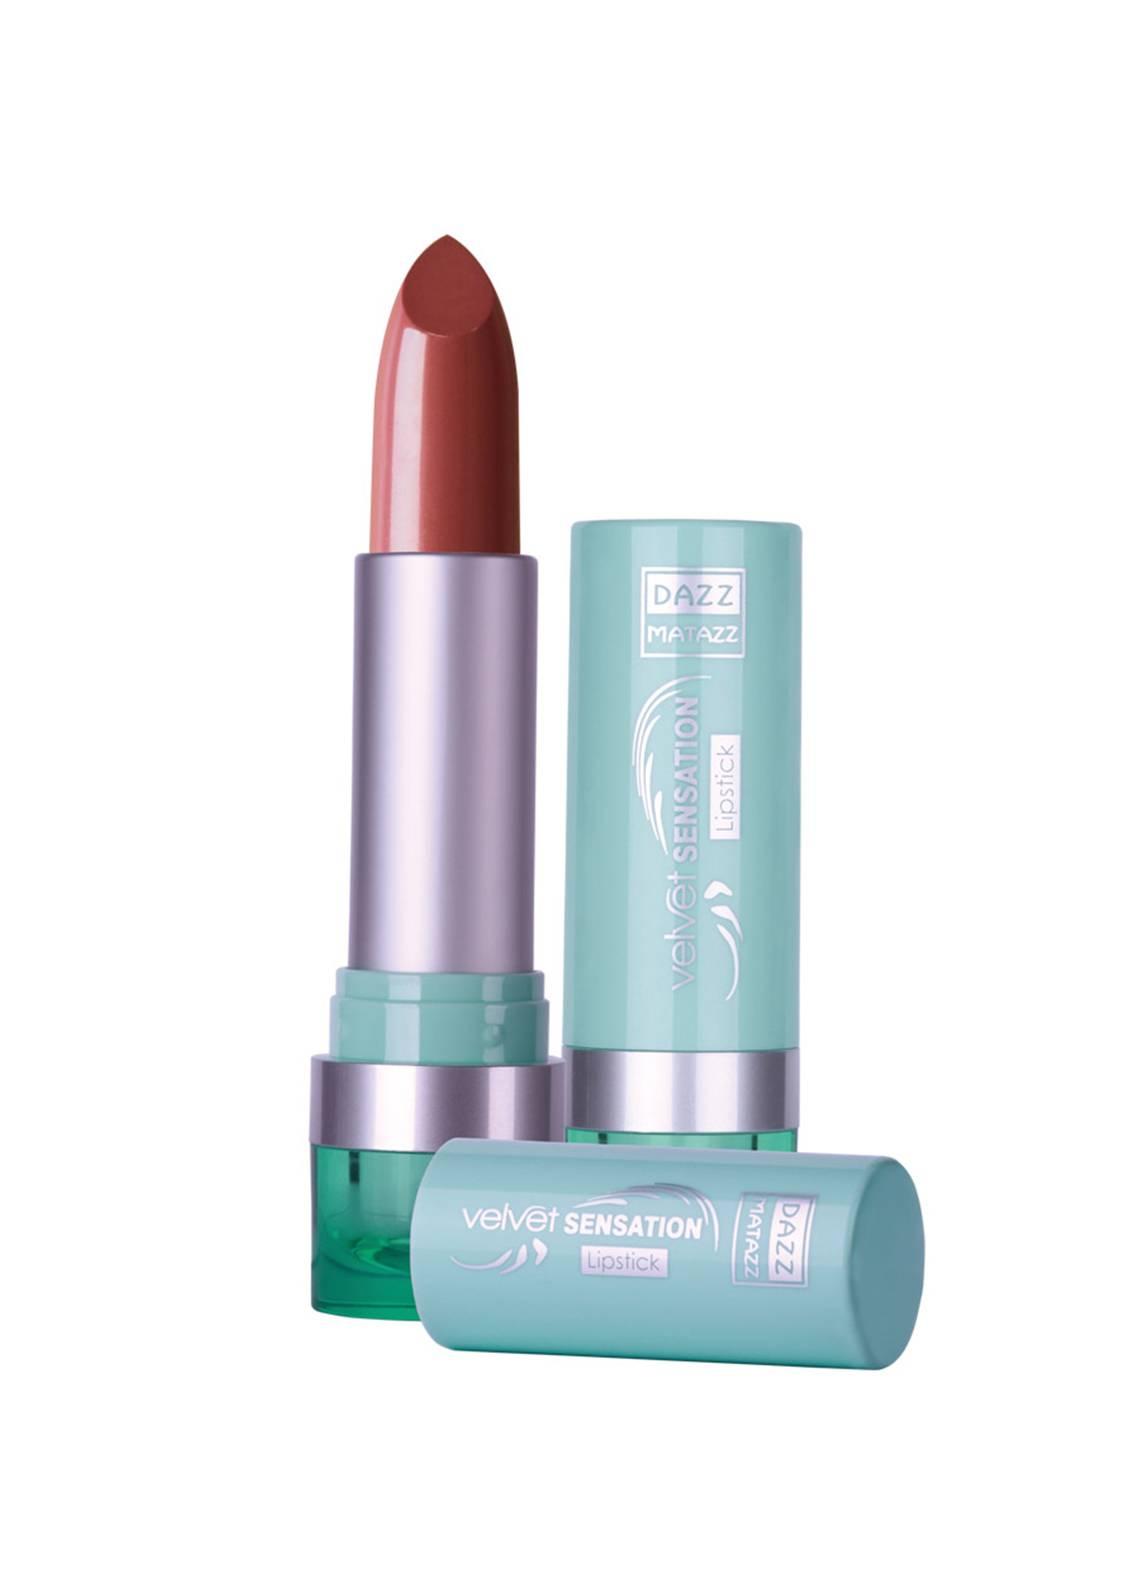 Dazz Matazz Velvet Sensation Lipstick-20 DUTCH TRUFFLE